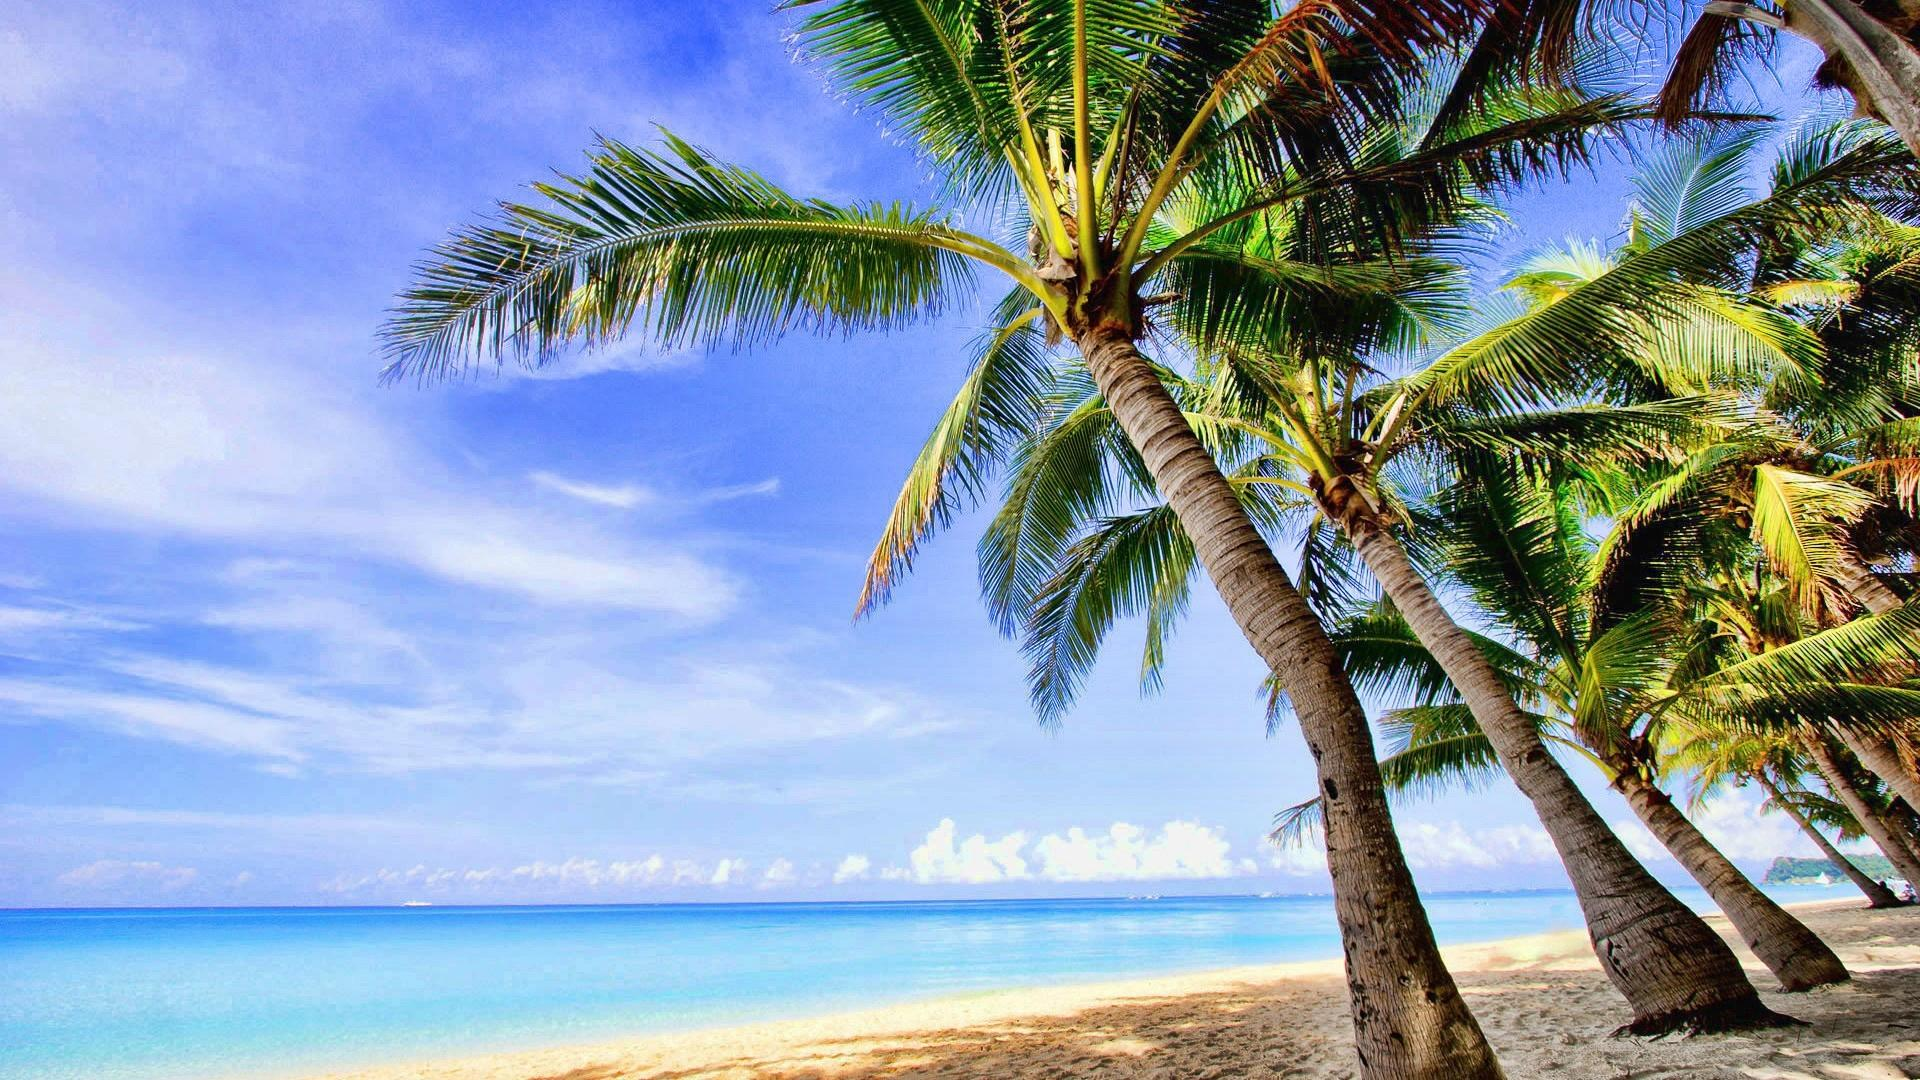 Landscapes tropical palm trees wallpaper 8393 1920x1080